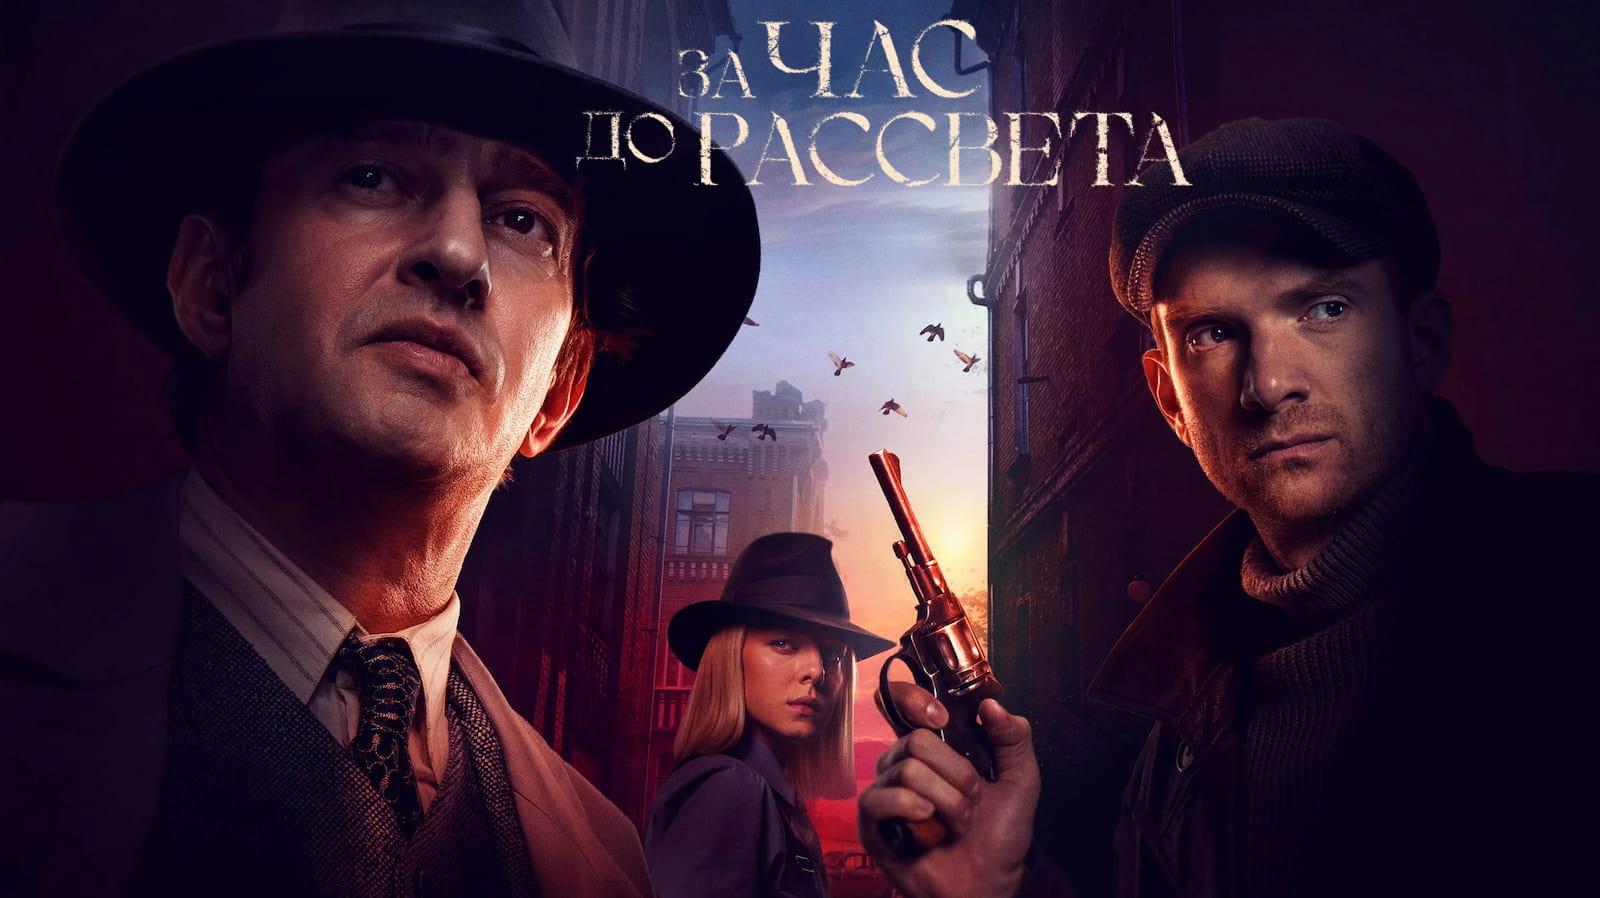 Постер сериала «За час до рассвета» (2021)